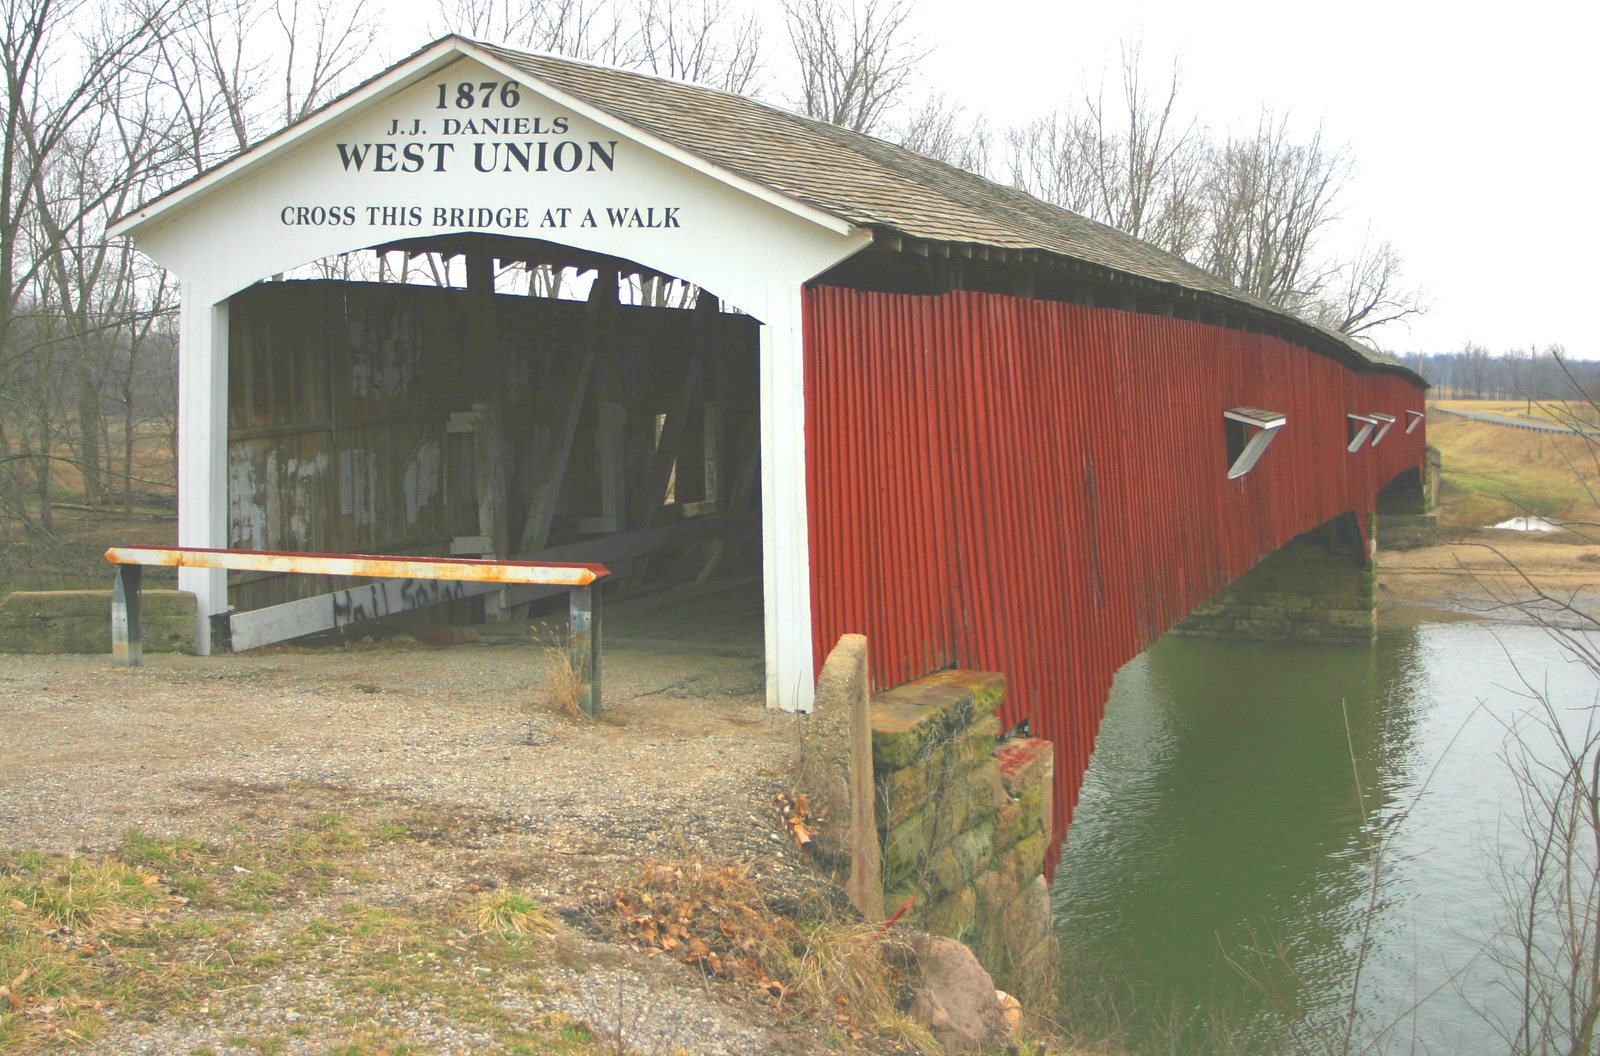 West Union Covered Bridge, Parke County, Indiana.